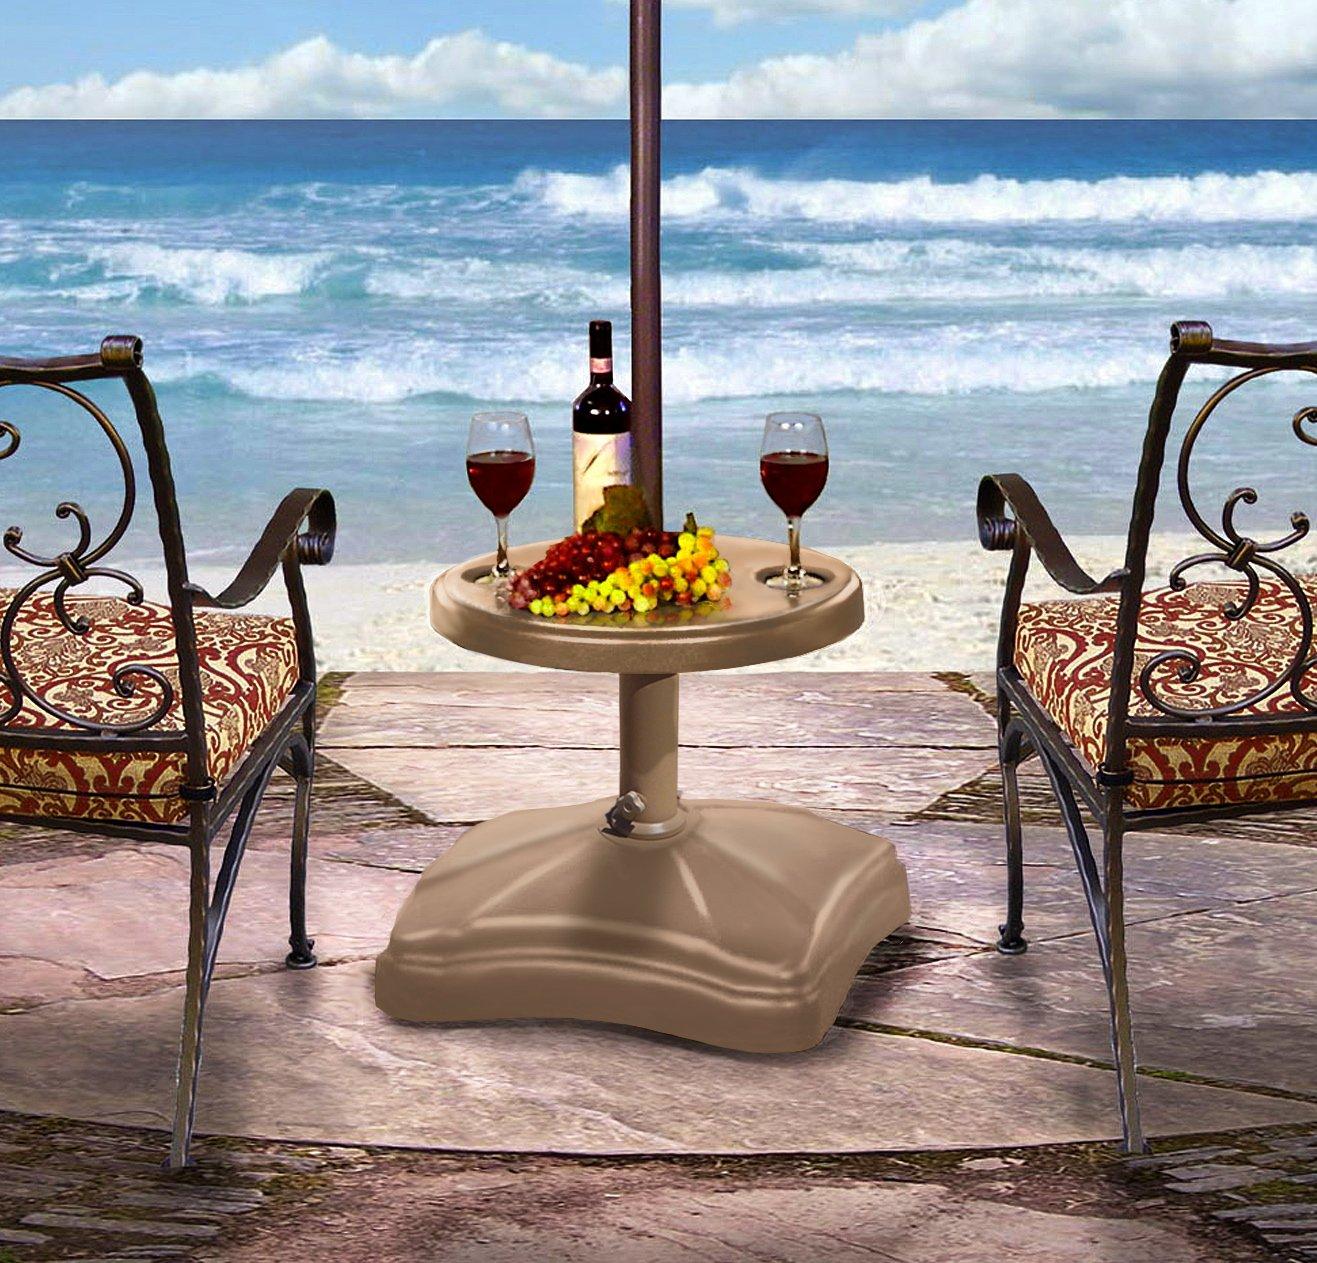 Amazon.com : Shademobile RU22 6275 Accessory Table, Bronze : Patio Umbrella  Bases : Garden U0026 Outdoor